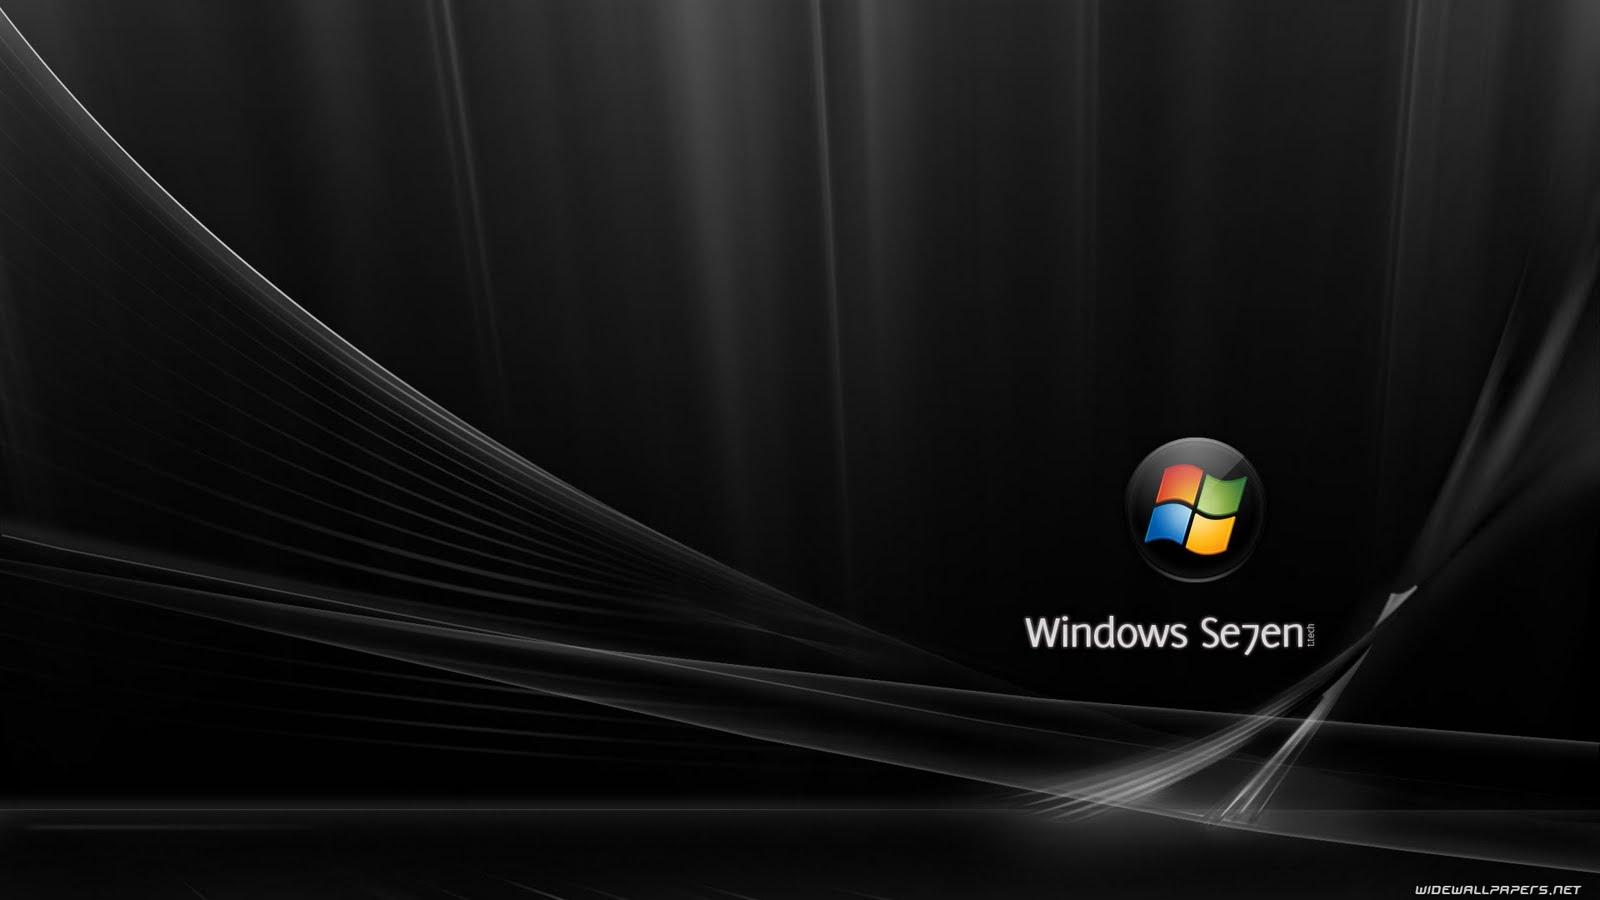 http://1.bp.blogspot.com/-vAwBD_stRF0/Tmes8Eov8YI/AAAAAAAAACQ/nykCXfPIJPs/s1600/windows7-wallpaper-1920x1080-015.jpg